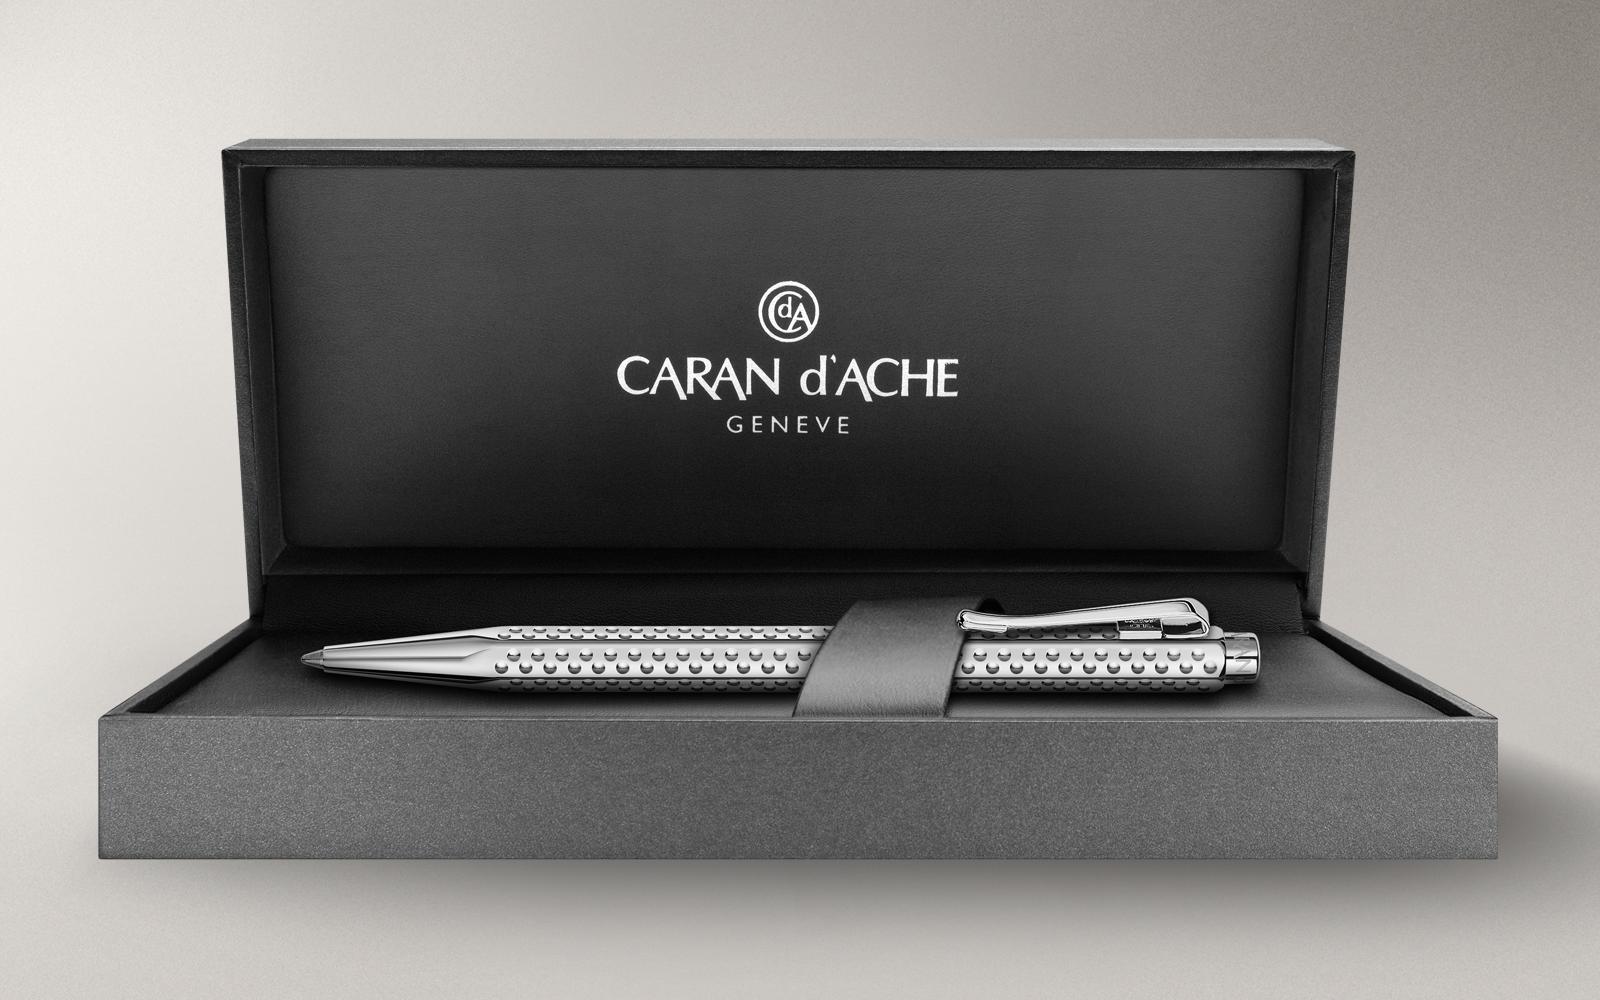 Carandache Ecridor - Golf PC, шариковая ручка, F